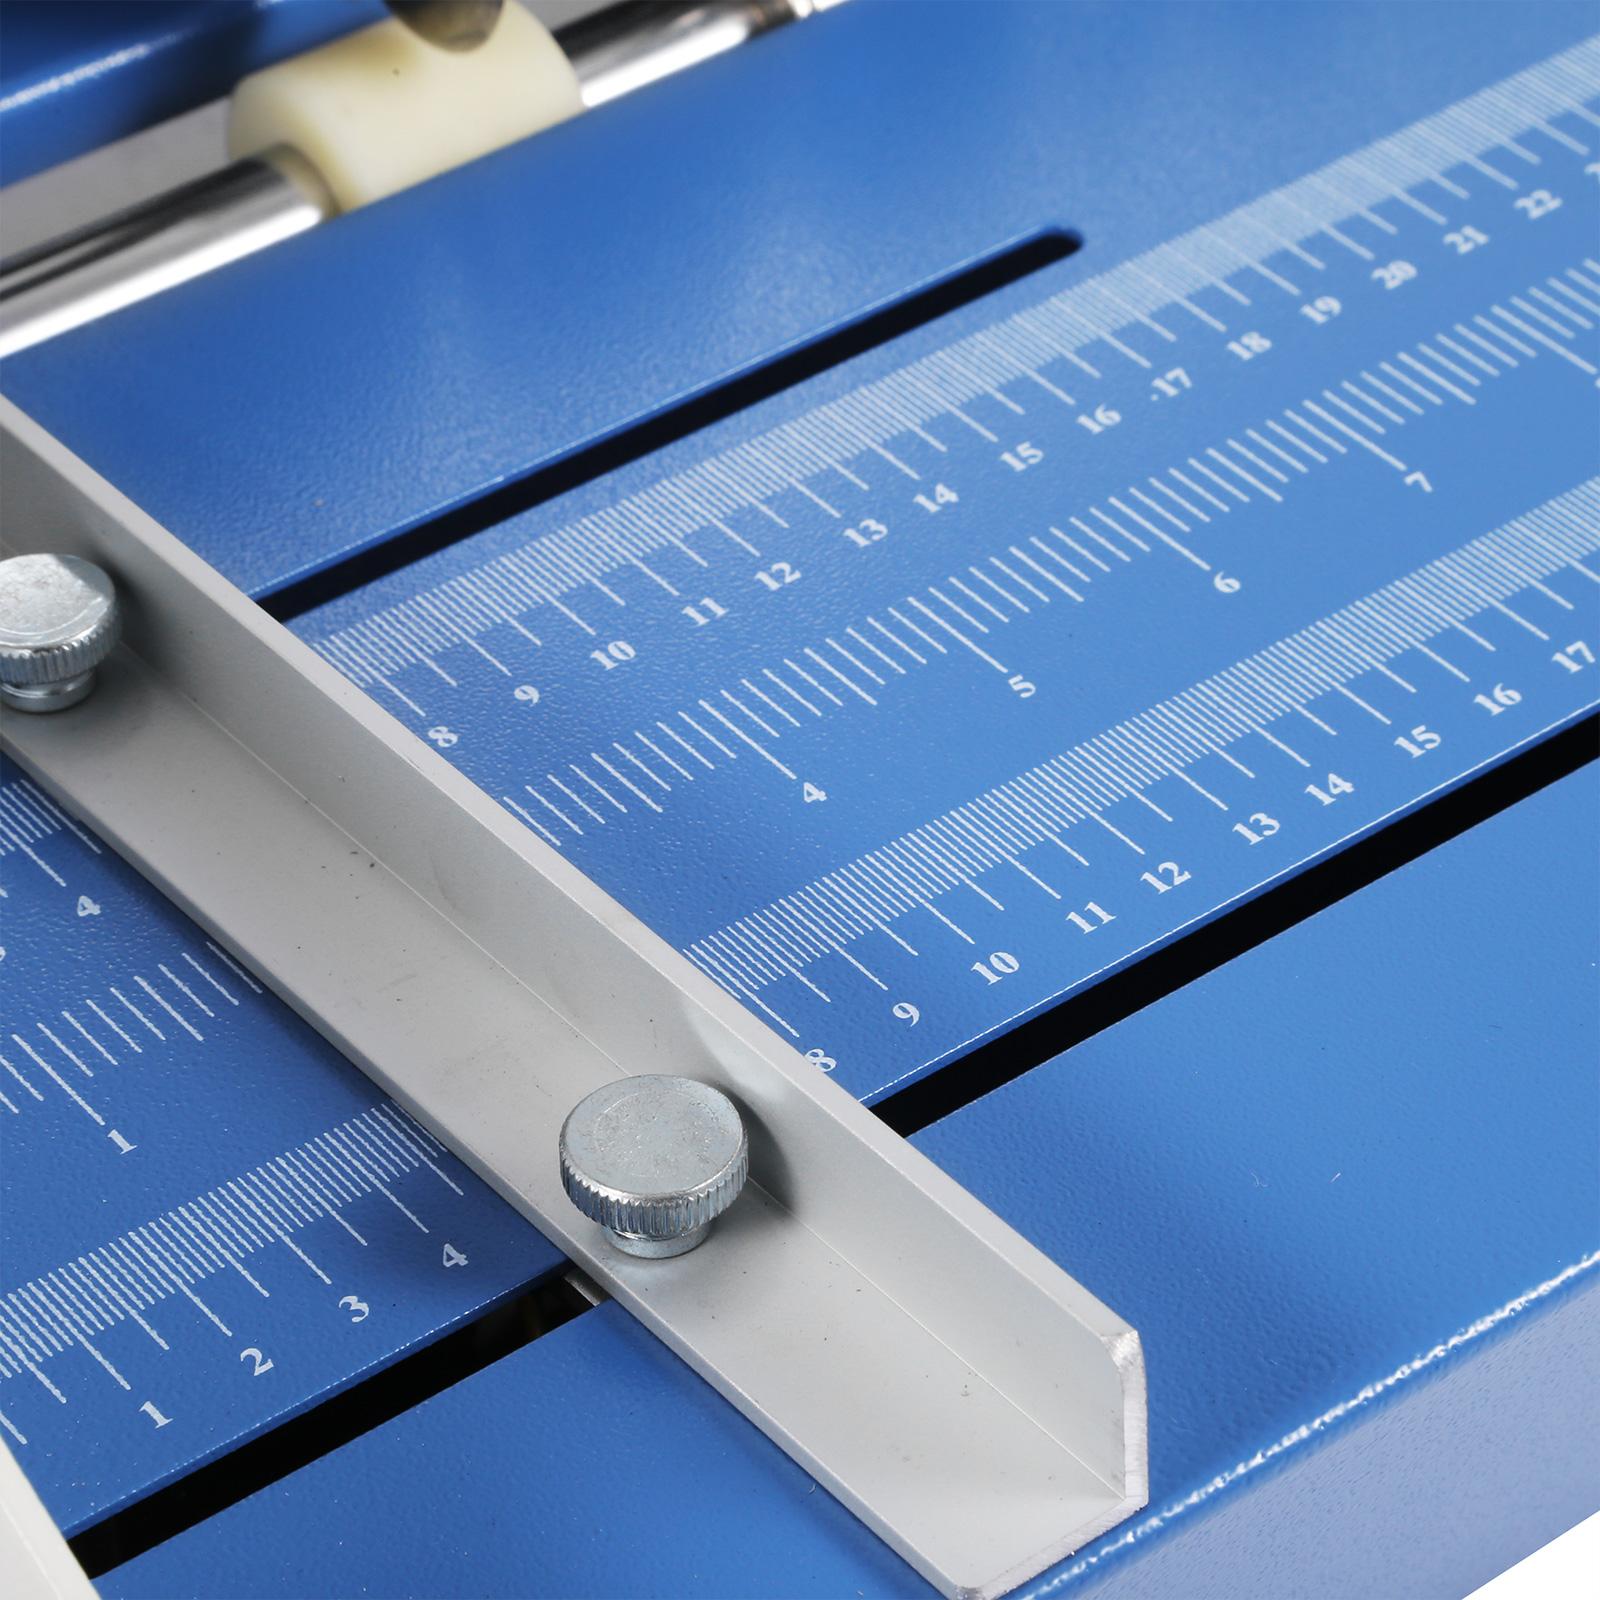 Cordonatrice-Perforatrice-Max-350-520mm-Profondita-Regolabile-Elettrica-Manuale miniatura 22